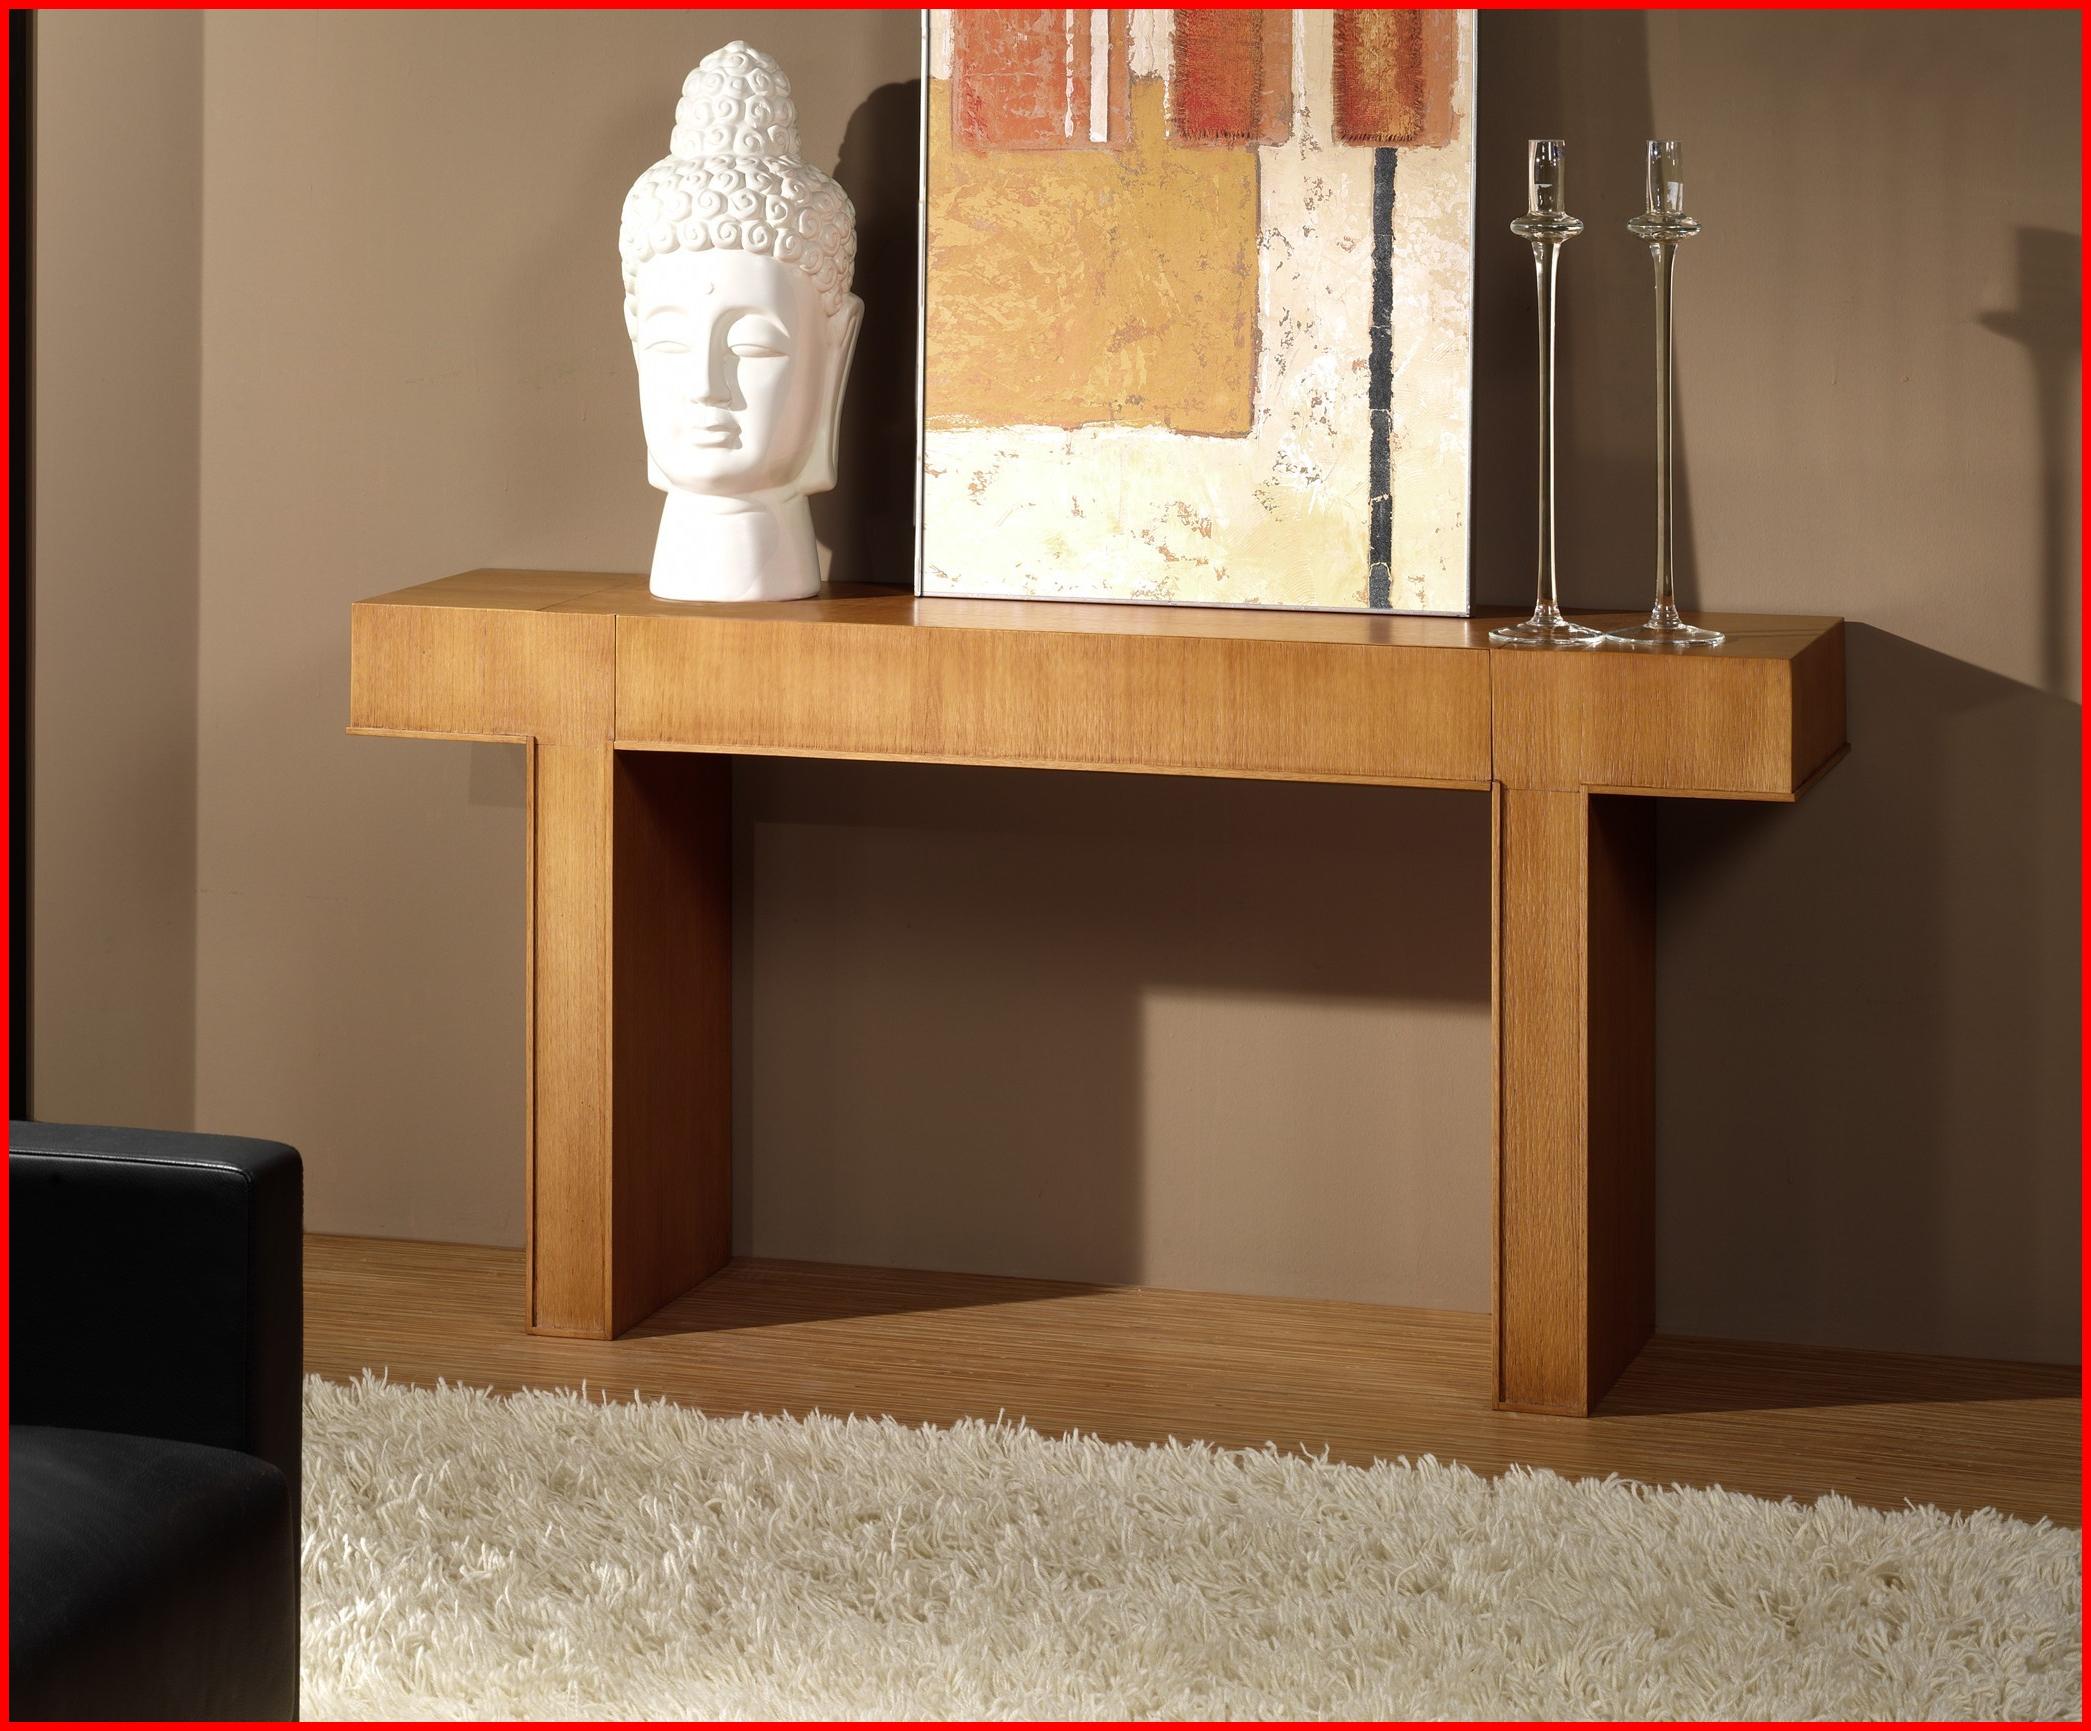 Muebles España Ftd8 Muebles De Espaà A Fabricantes De Muebles Modernos Jardin En